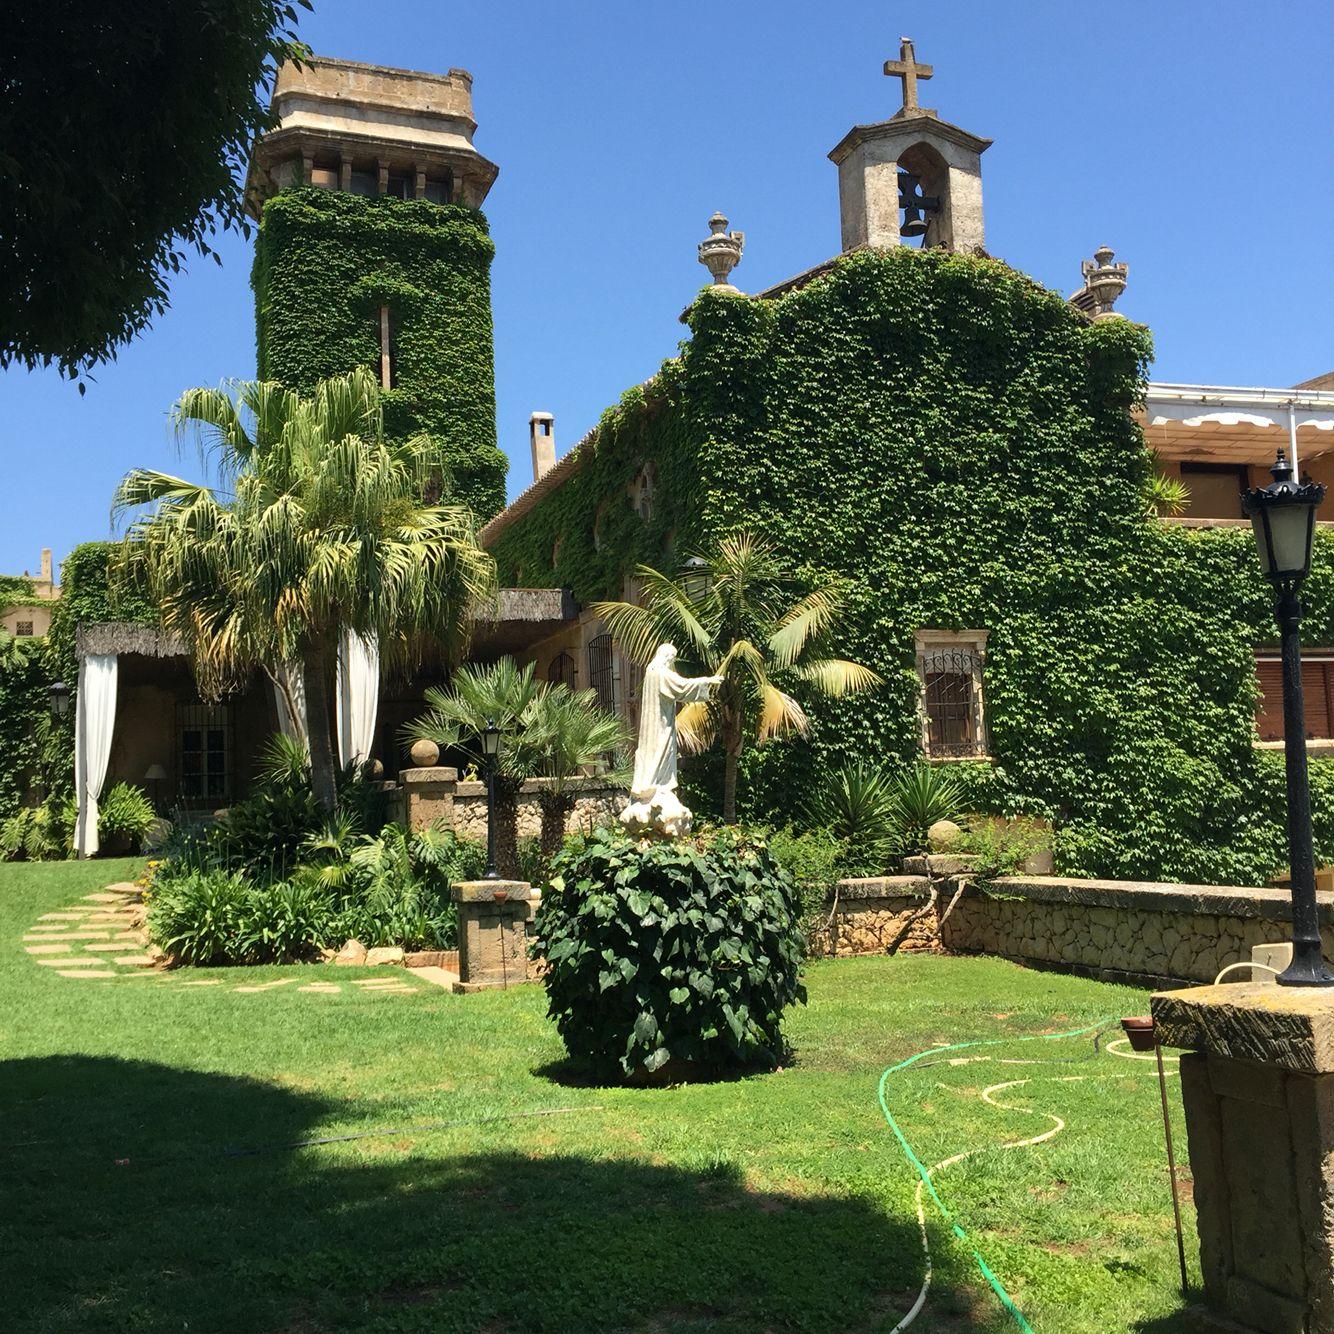 casa santonja beniarbeig alicante wedding spain costa